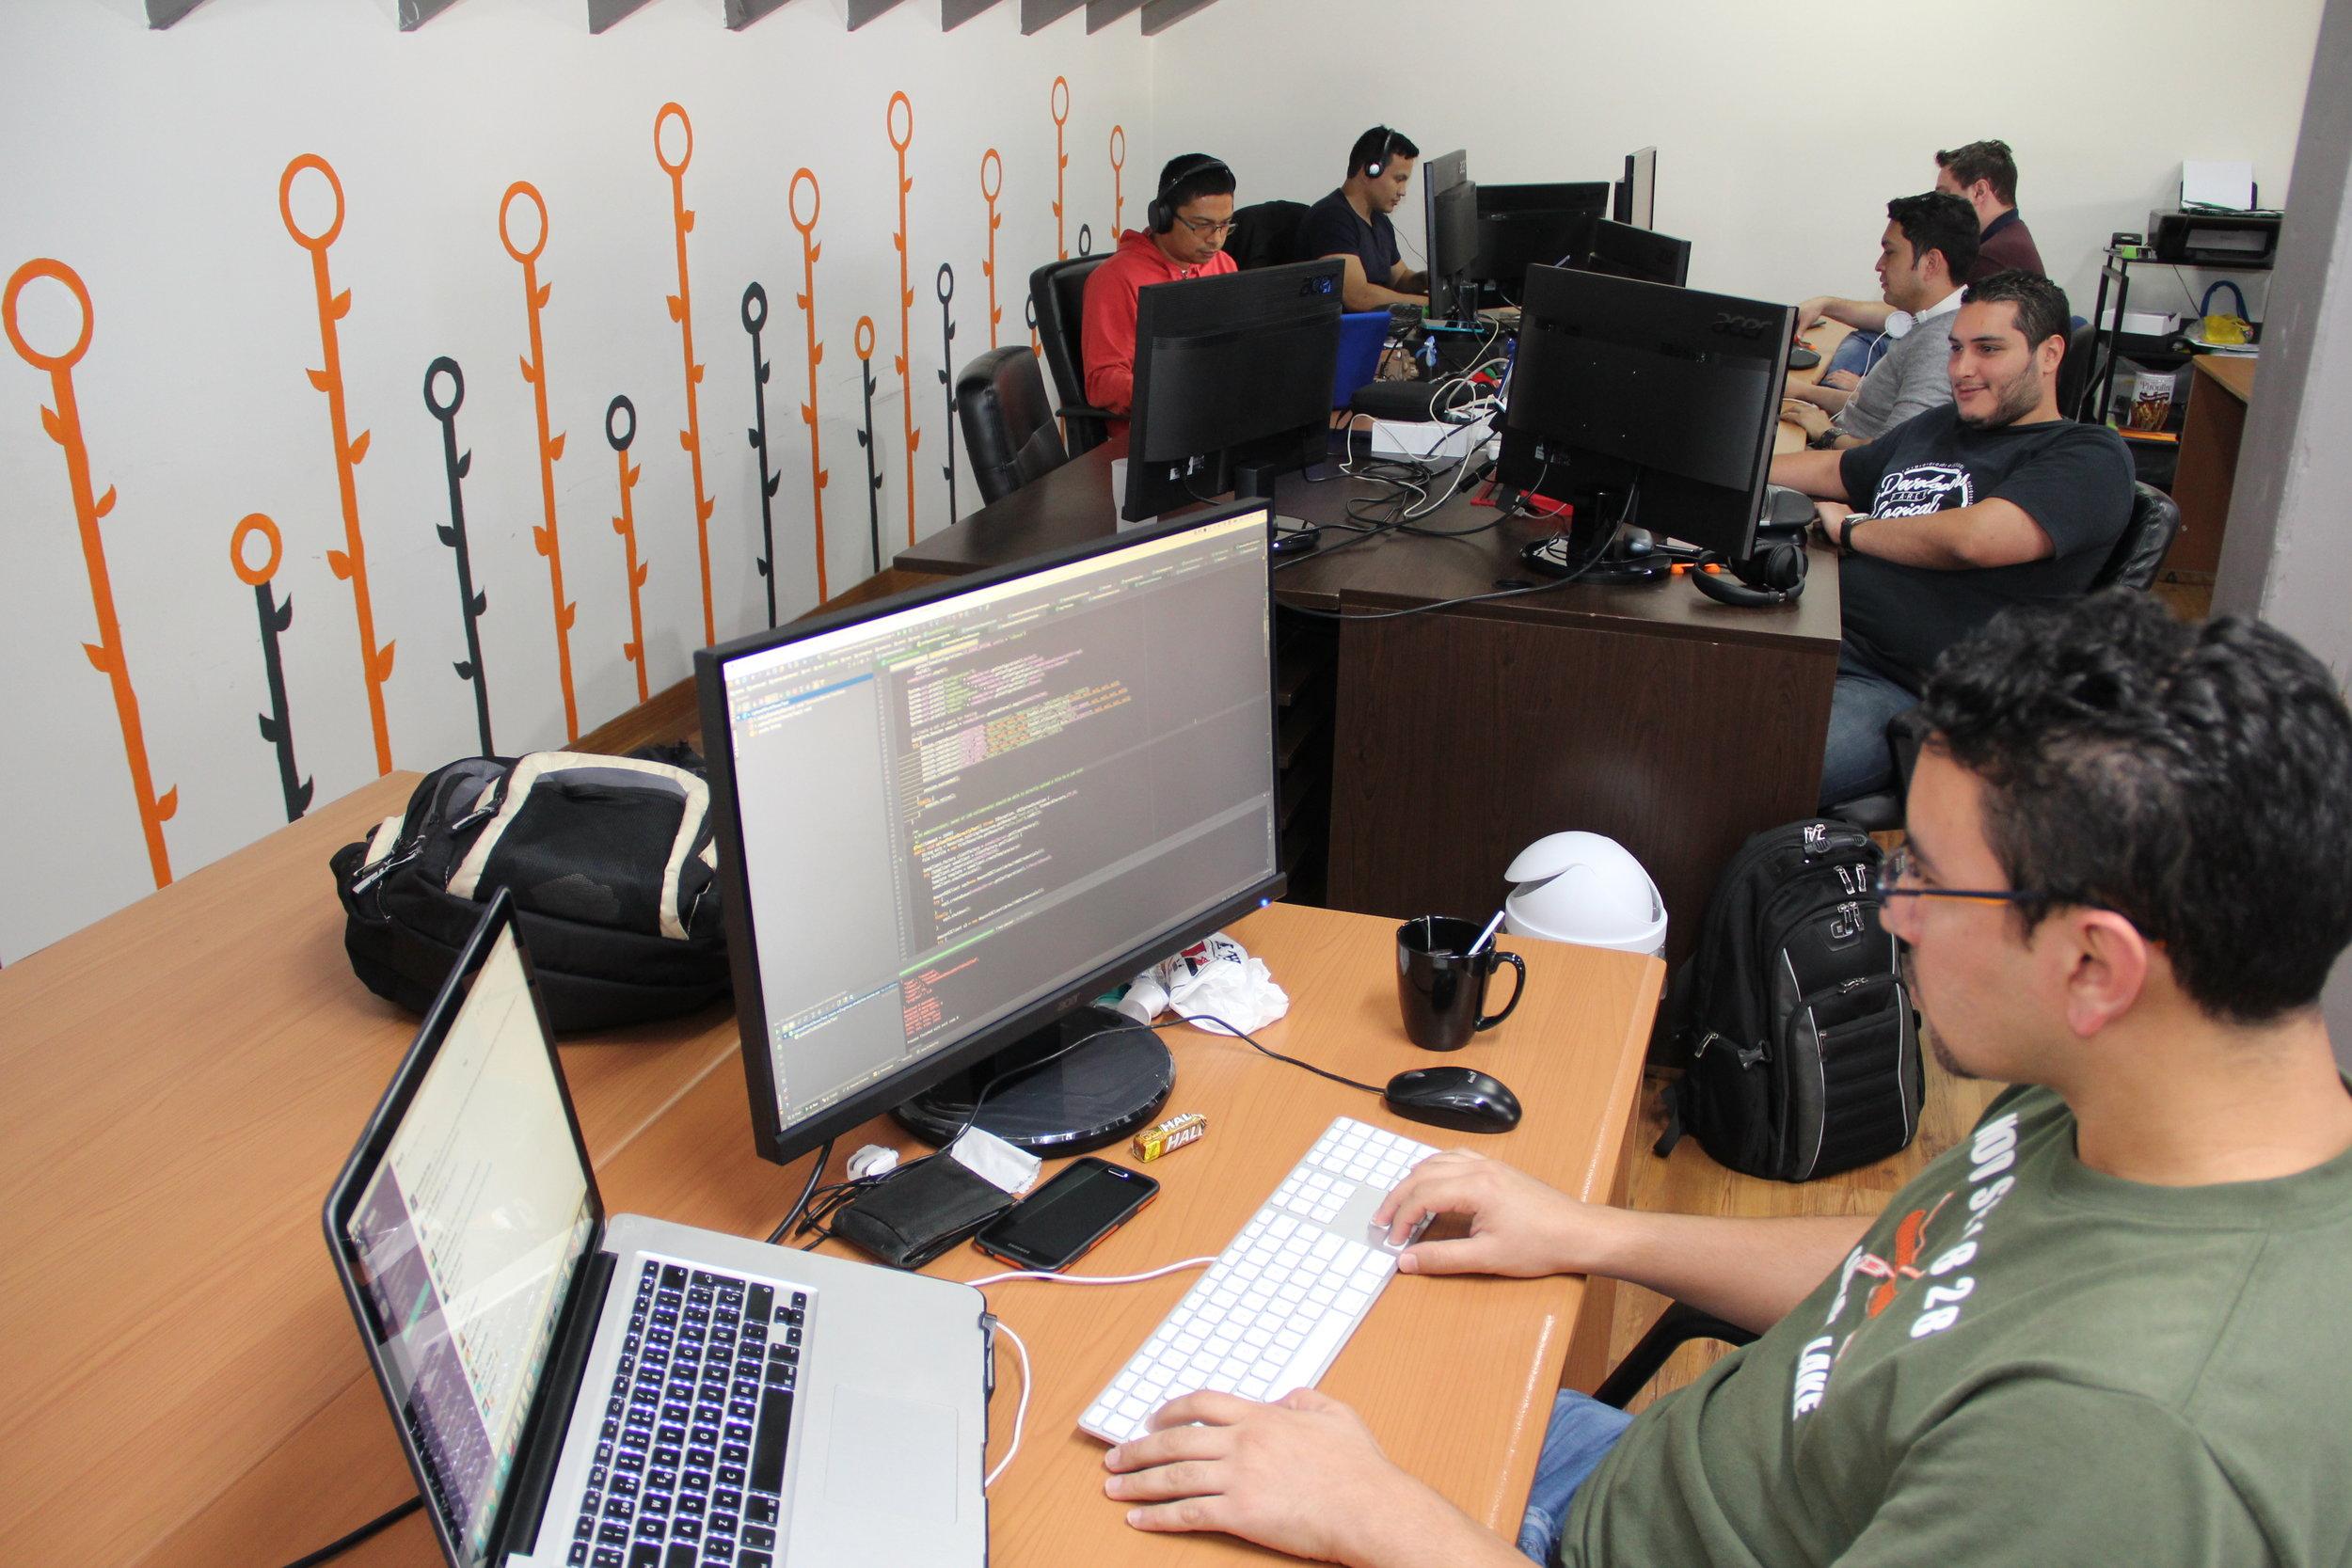 Software-developers-working-together-on-computer.jpg